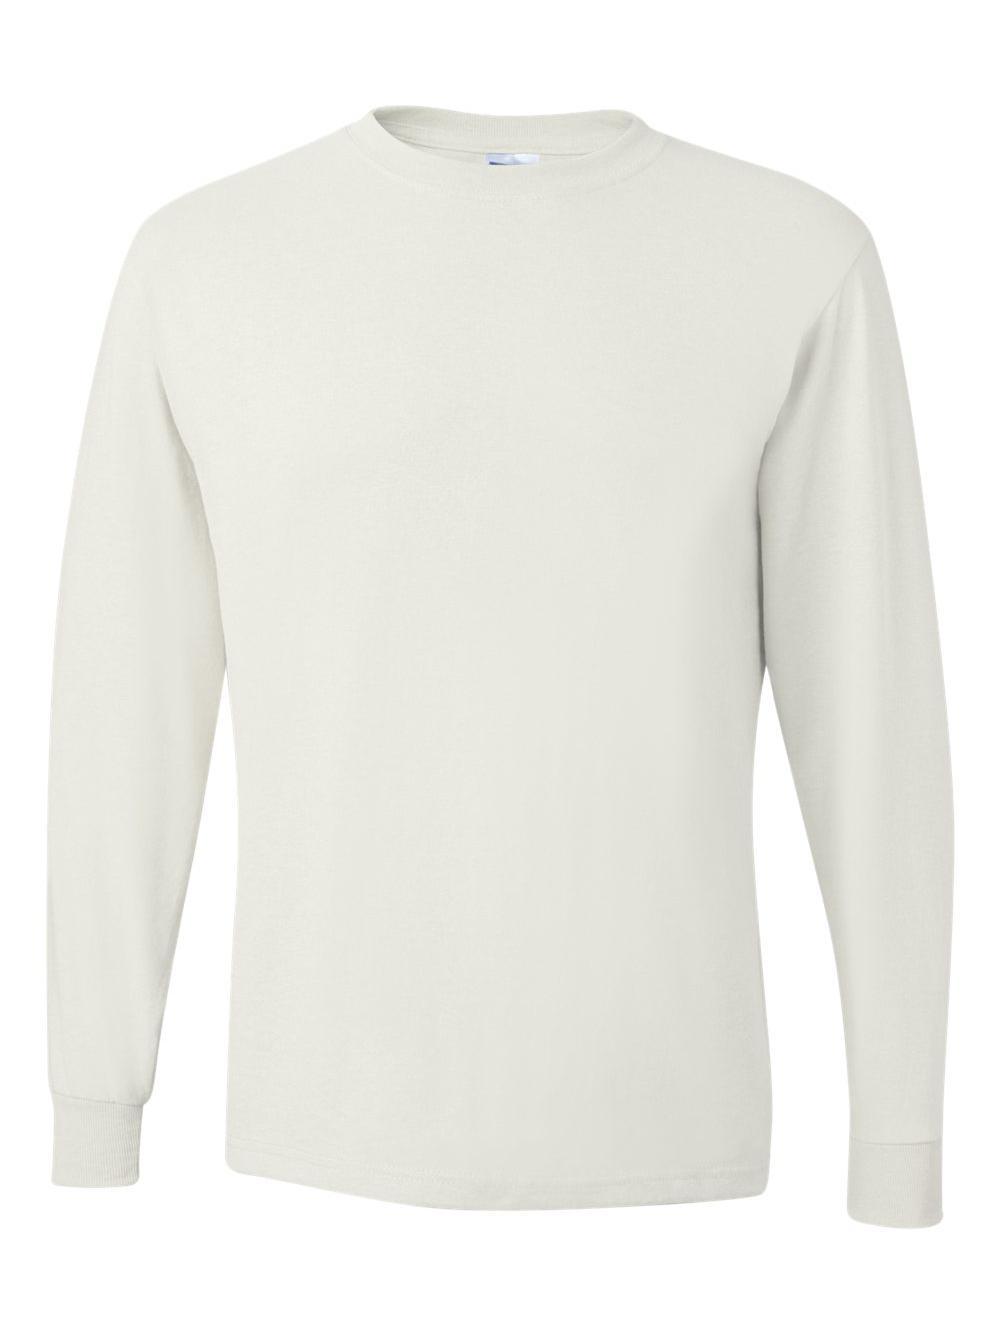 Jerzees-Dri-Power-Long-Sleeve-50-50-T-Shirt-29LSR thumbnail 90